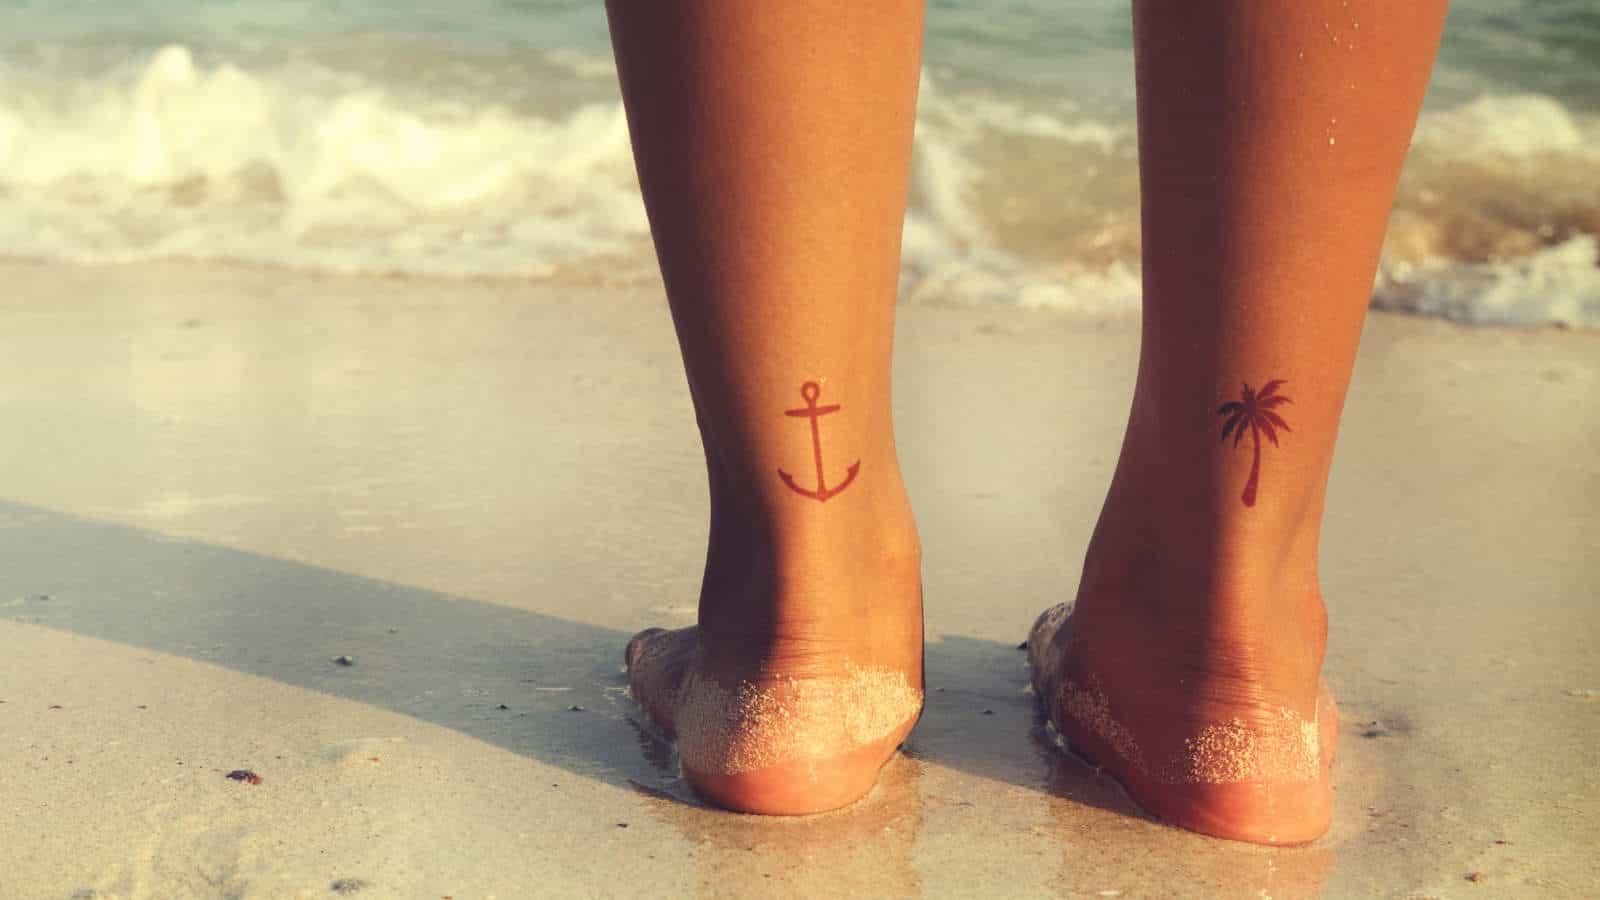 Anker Tattoo Die Bedeutung Dahinter Tolle Inspirierende Motive